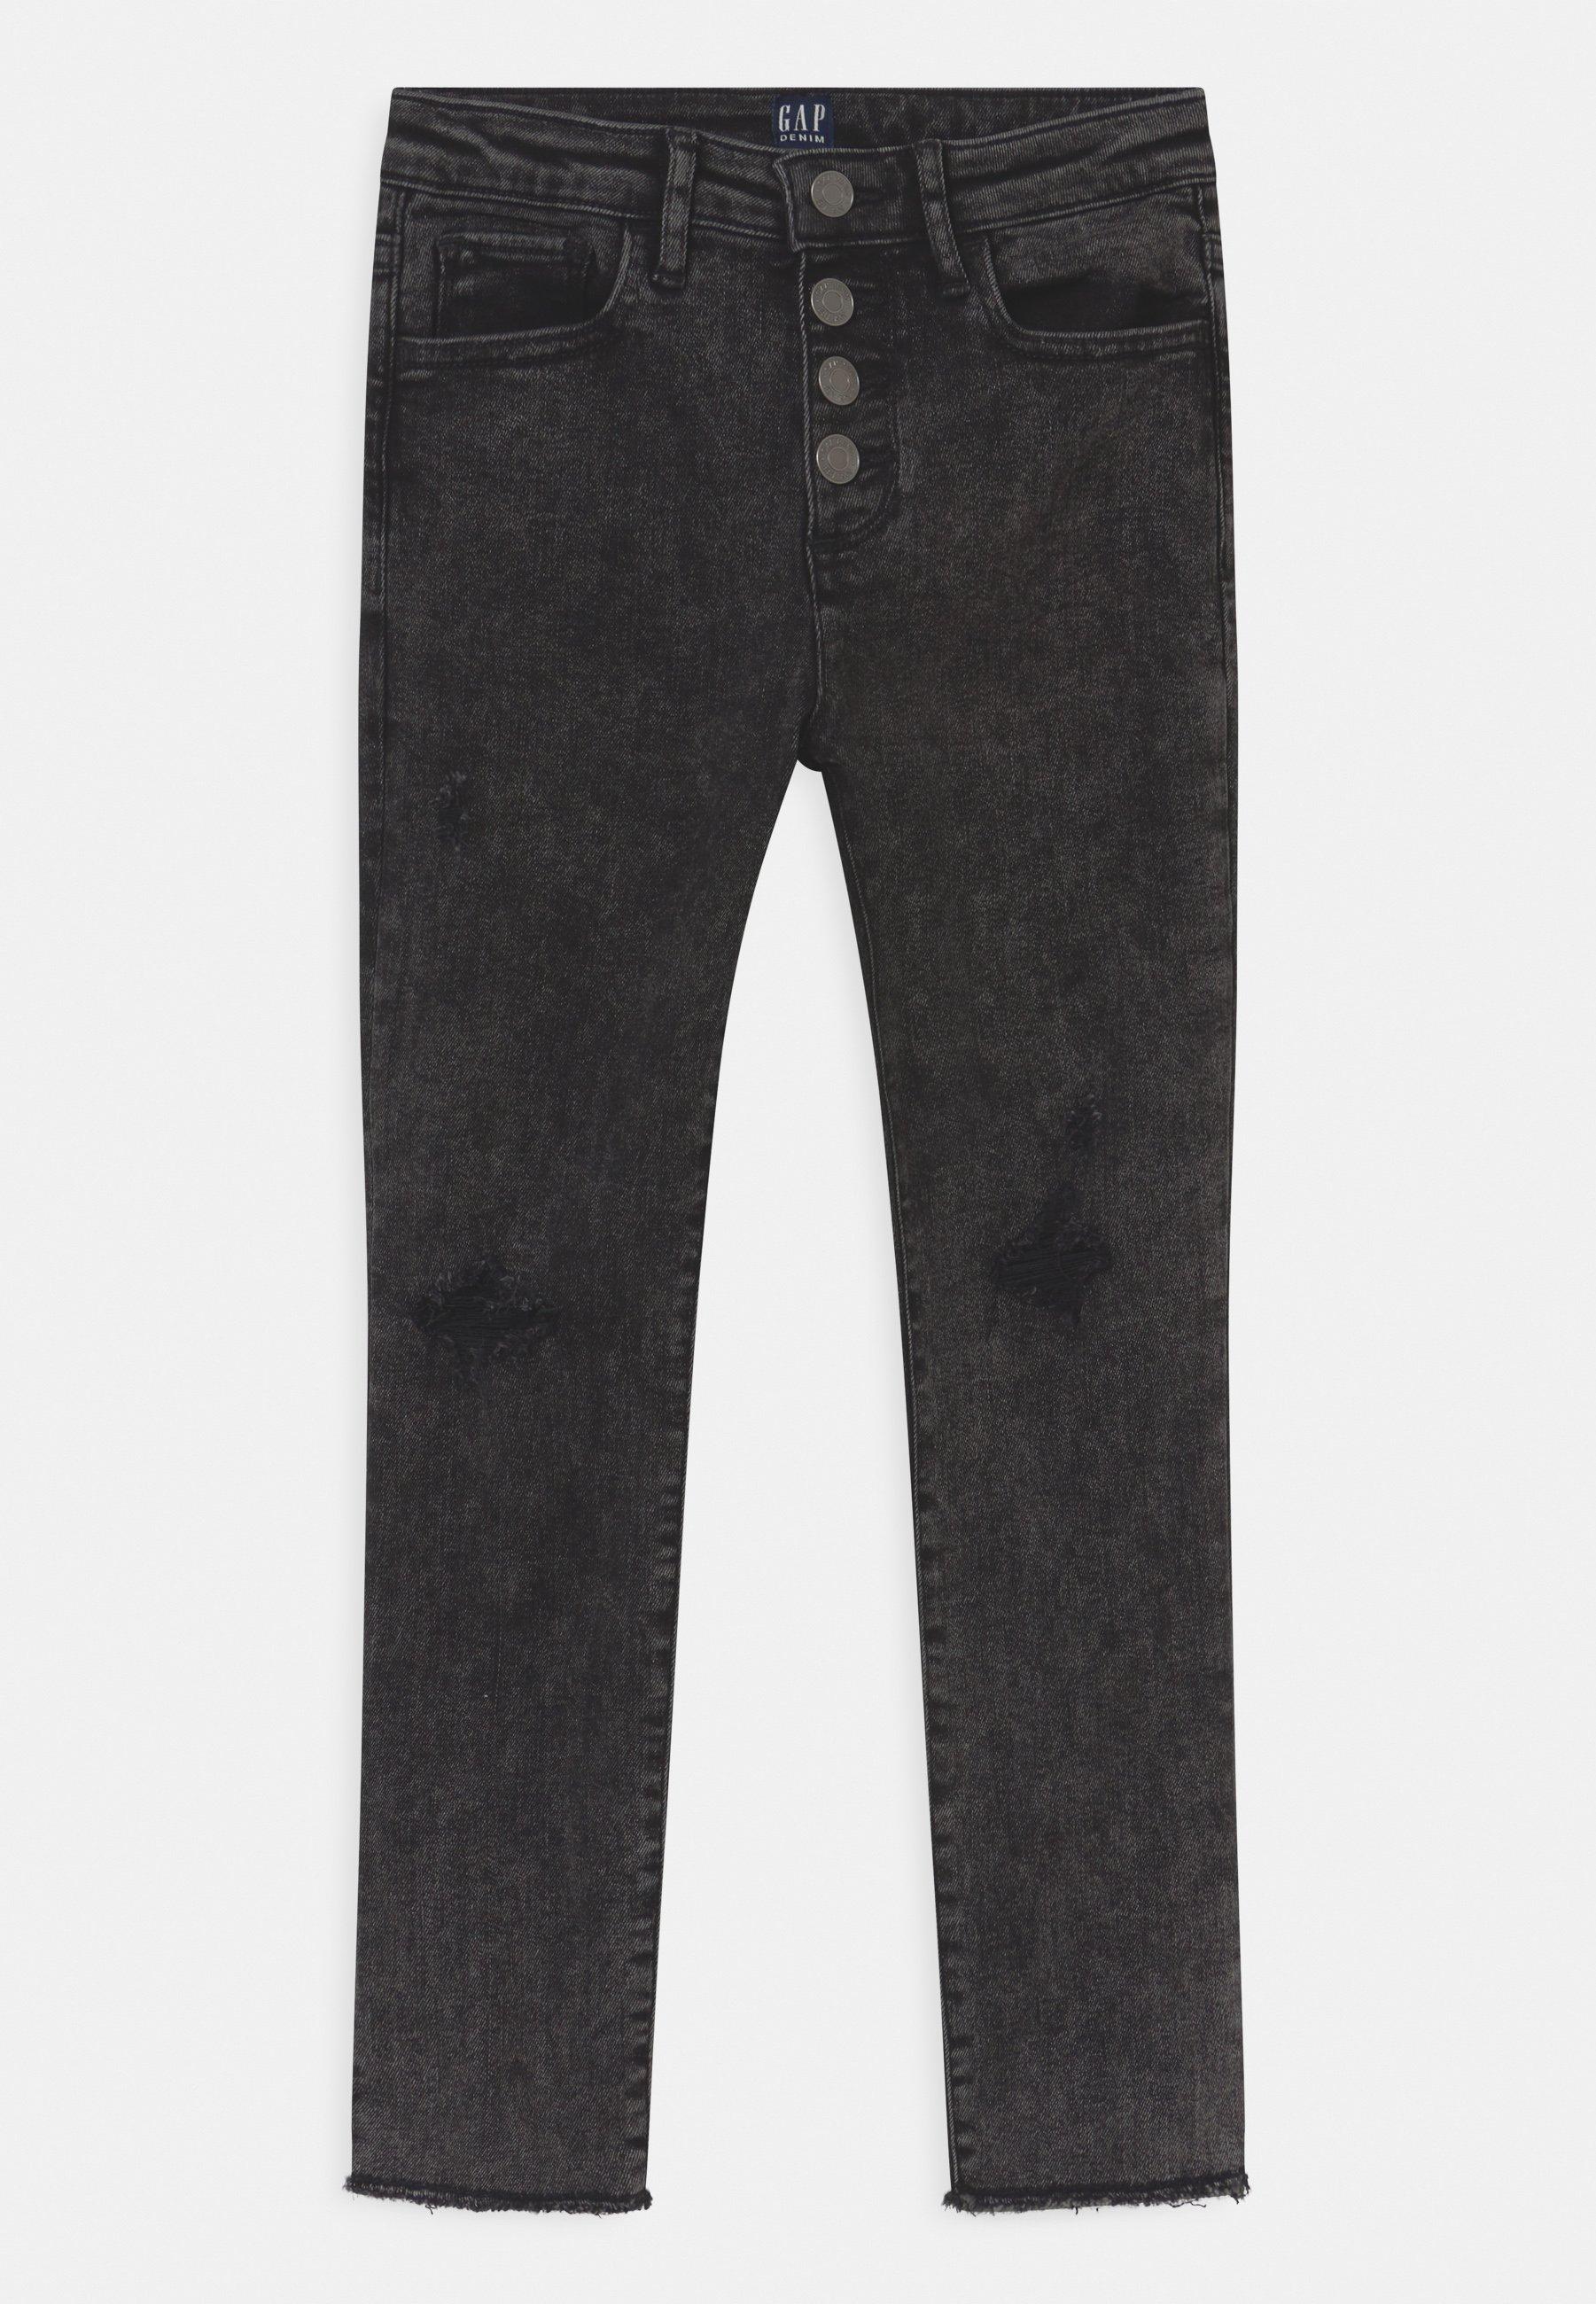 Kids GIRL ANK WASH - Slim fit jeans - black